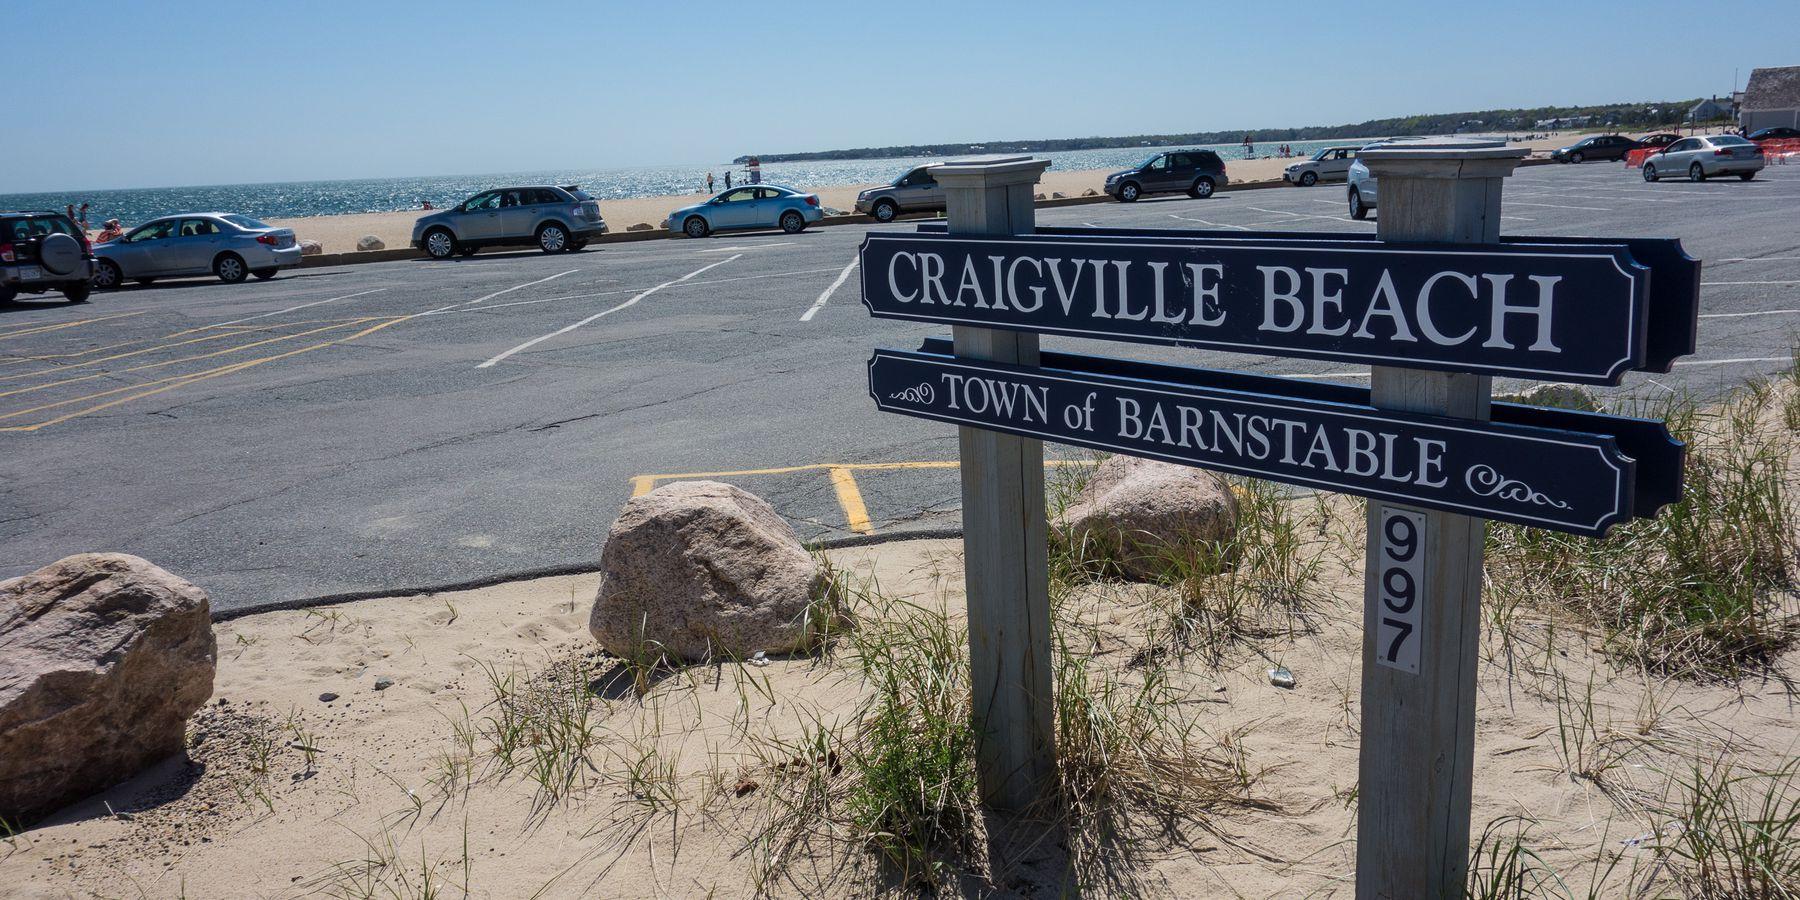 Craigville Beach - Cape Cod - Massachusetts - Doets Reizen